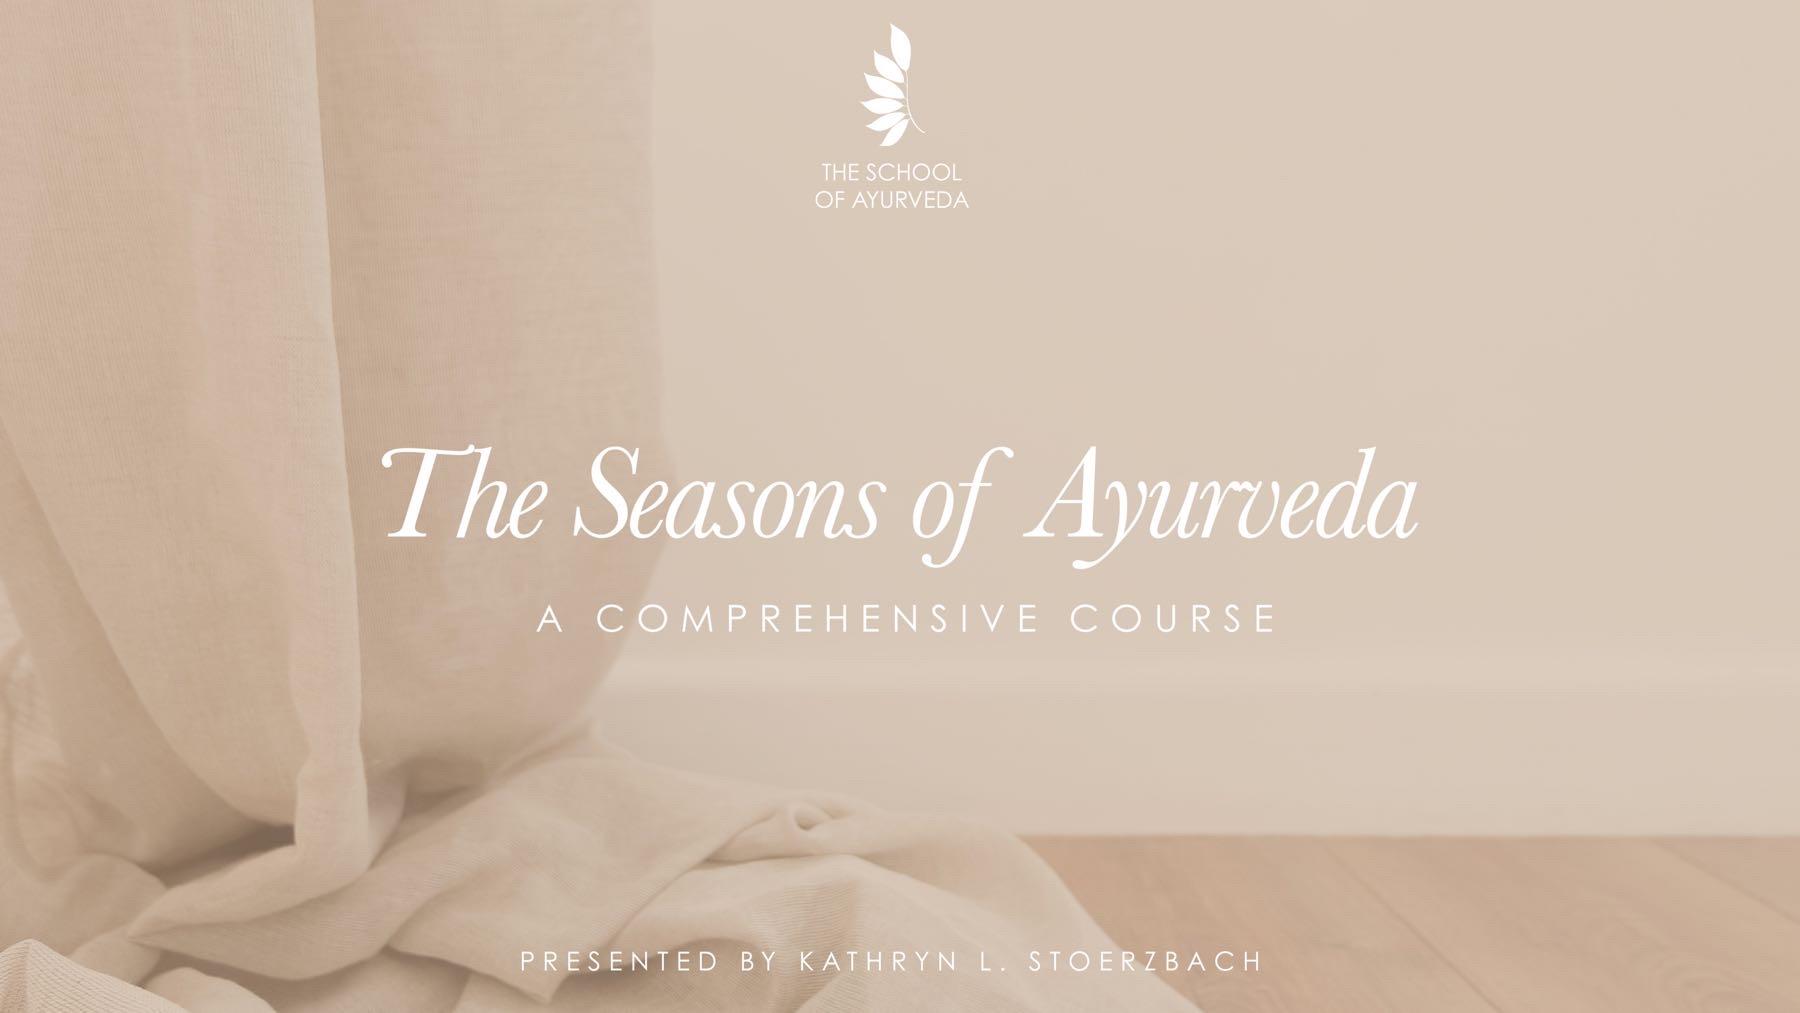 The Seasons of Ayurveda, comprehensive course